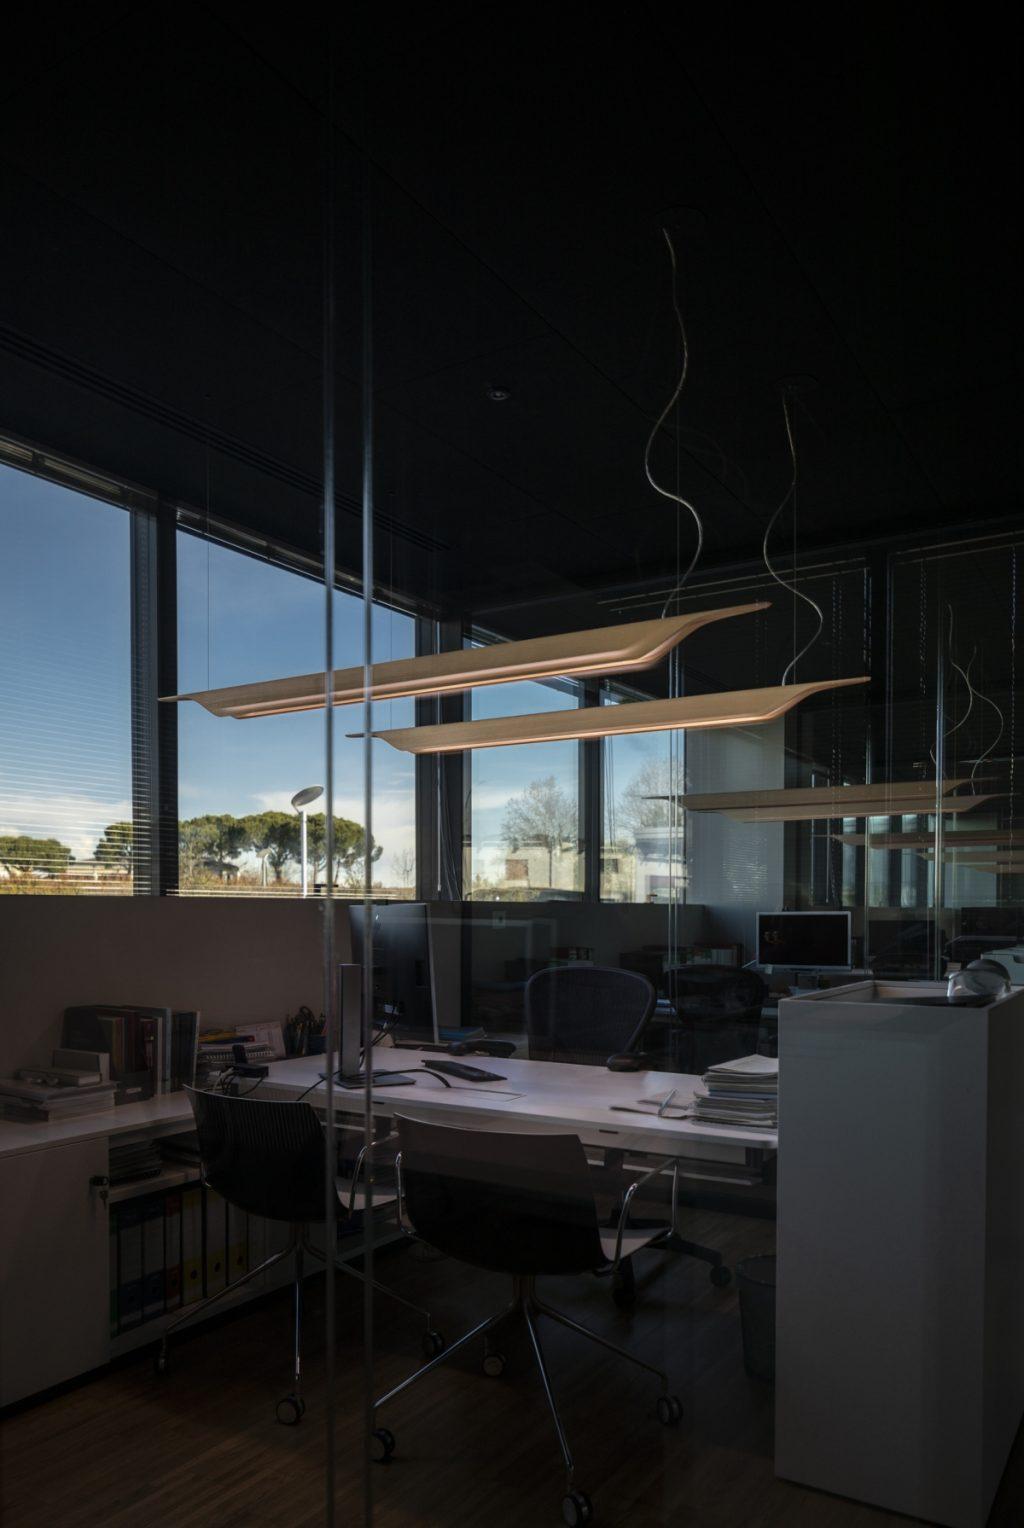 Lámpara de suspensión TROAG design Luca Nichetto para Foscarini